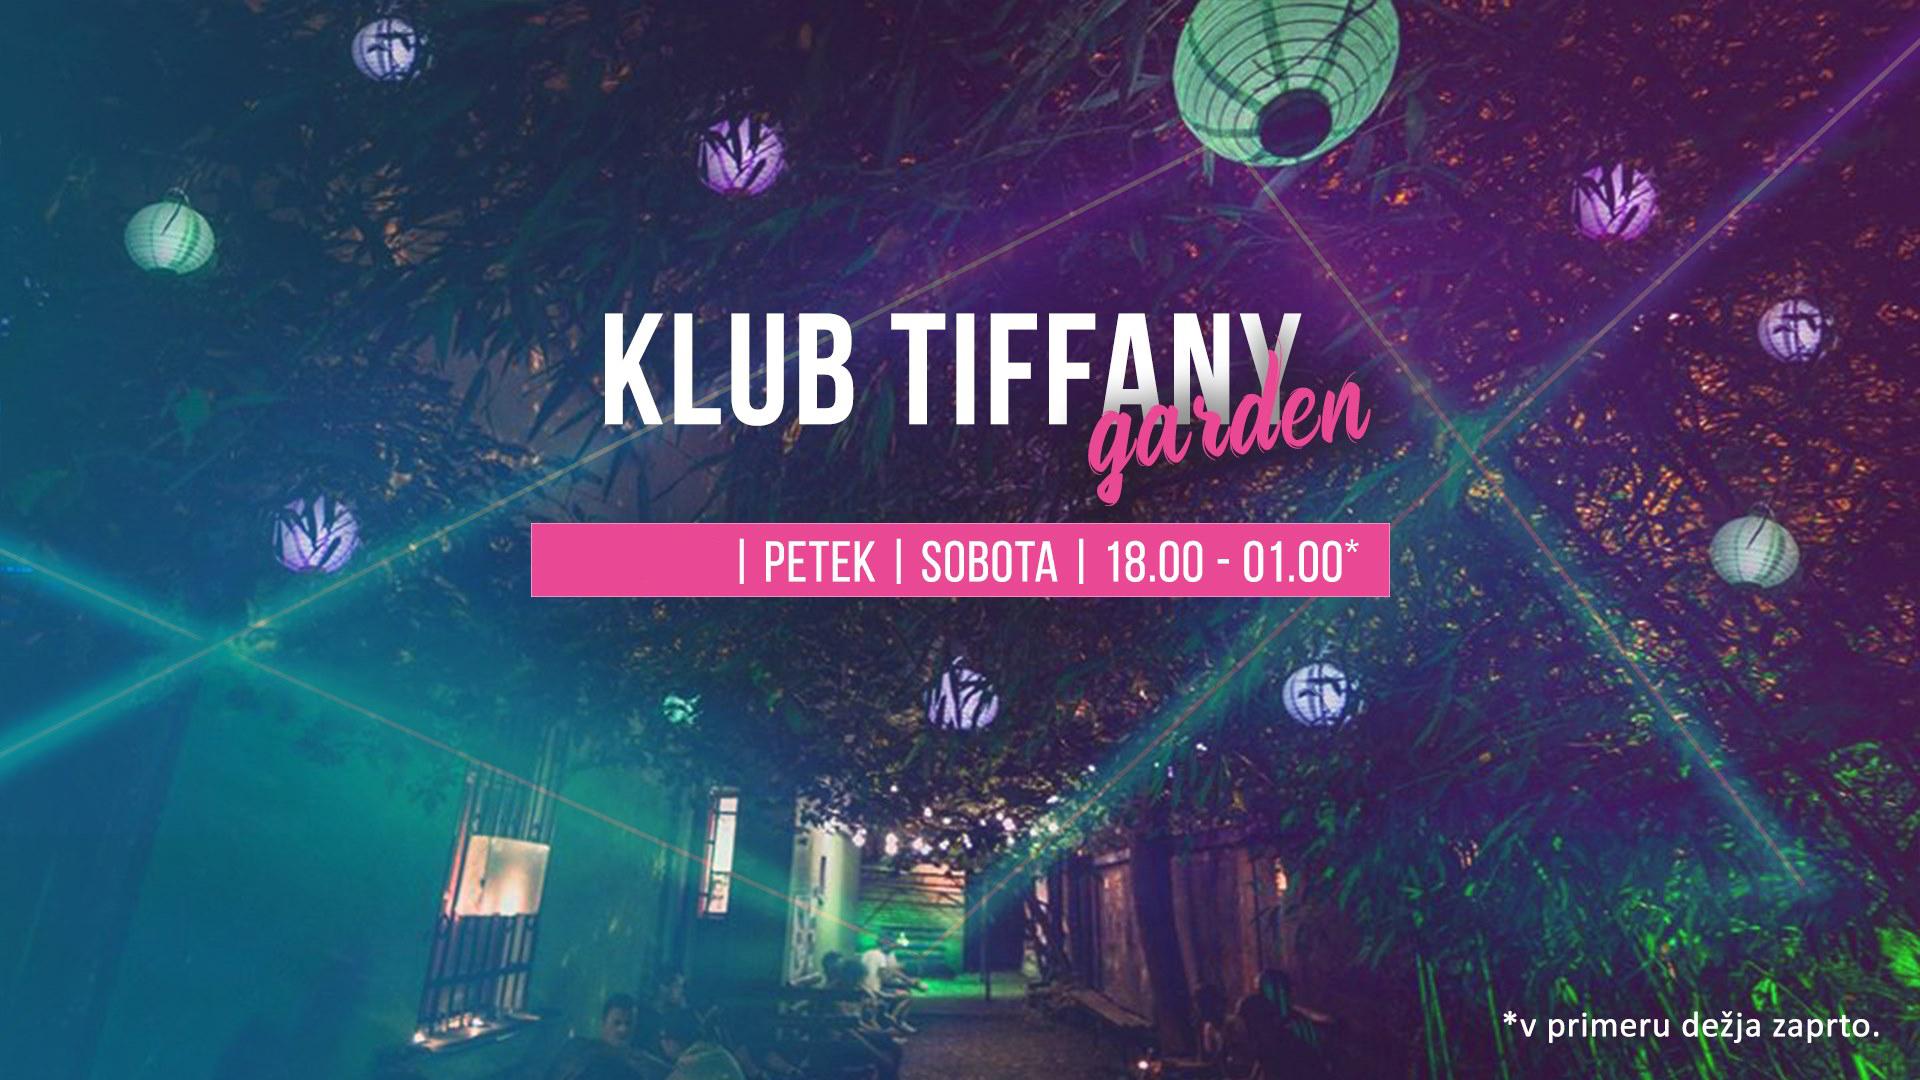 Klub Tiffany Garden avgust